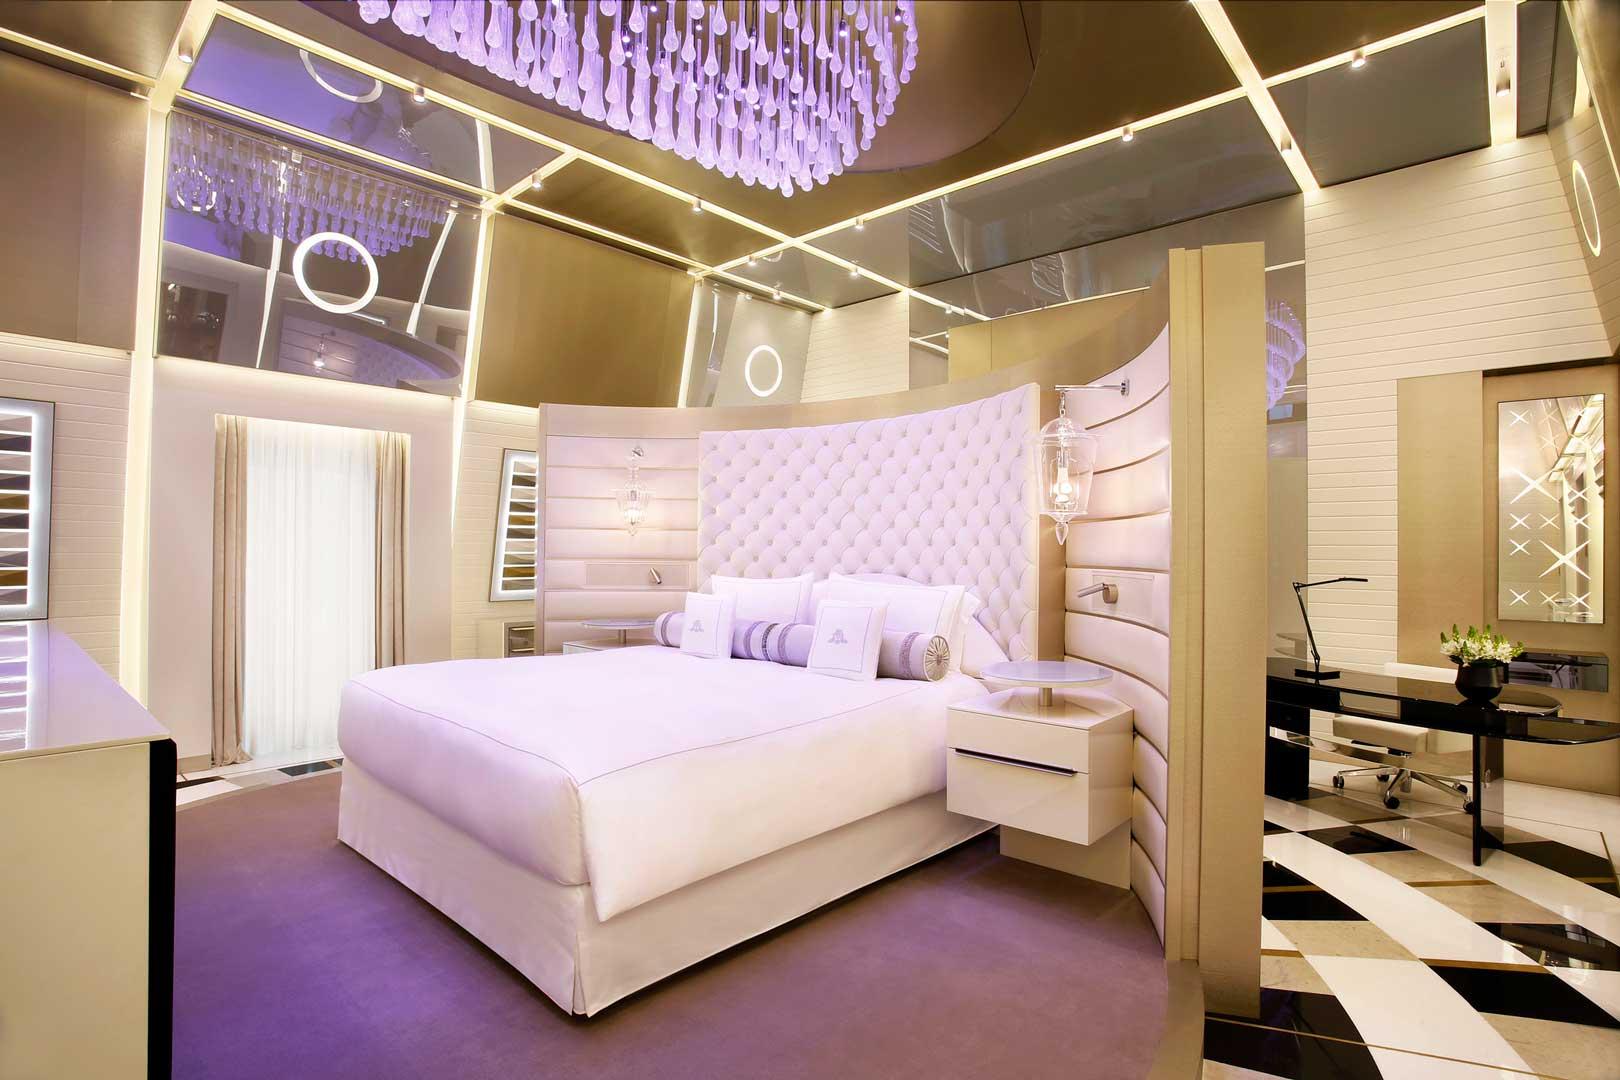 Excelsior Hotel Gallia | Katara Suite - Master Bedroom